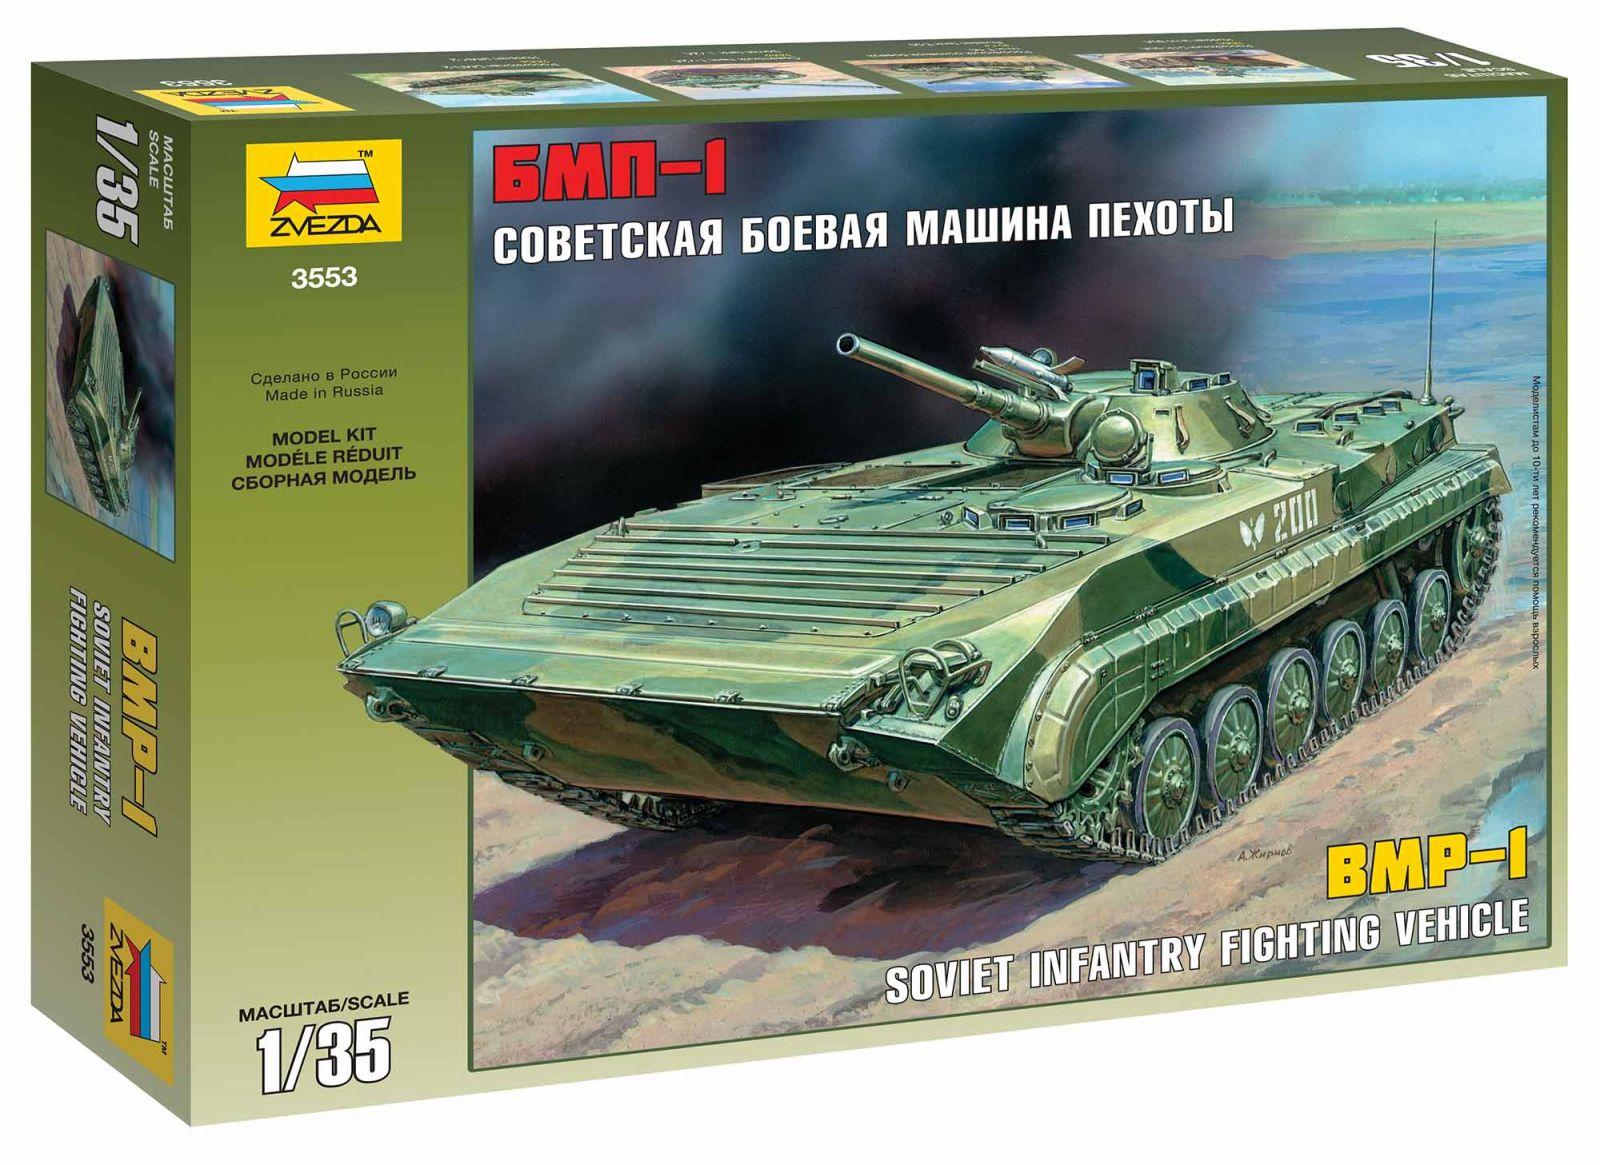 Model Kit military 3553 - BMP-1 (1:35) Plastikové modely